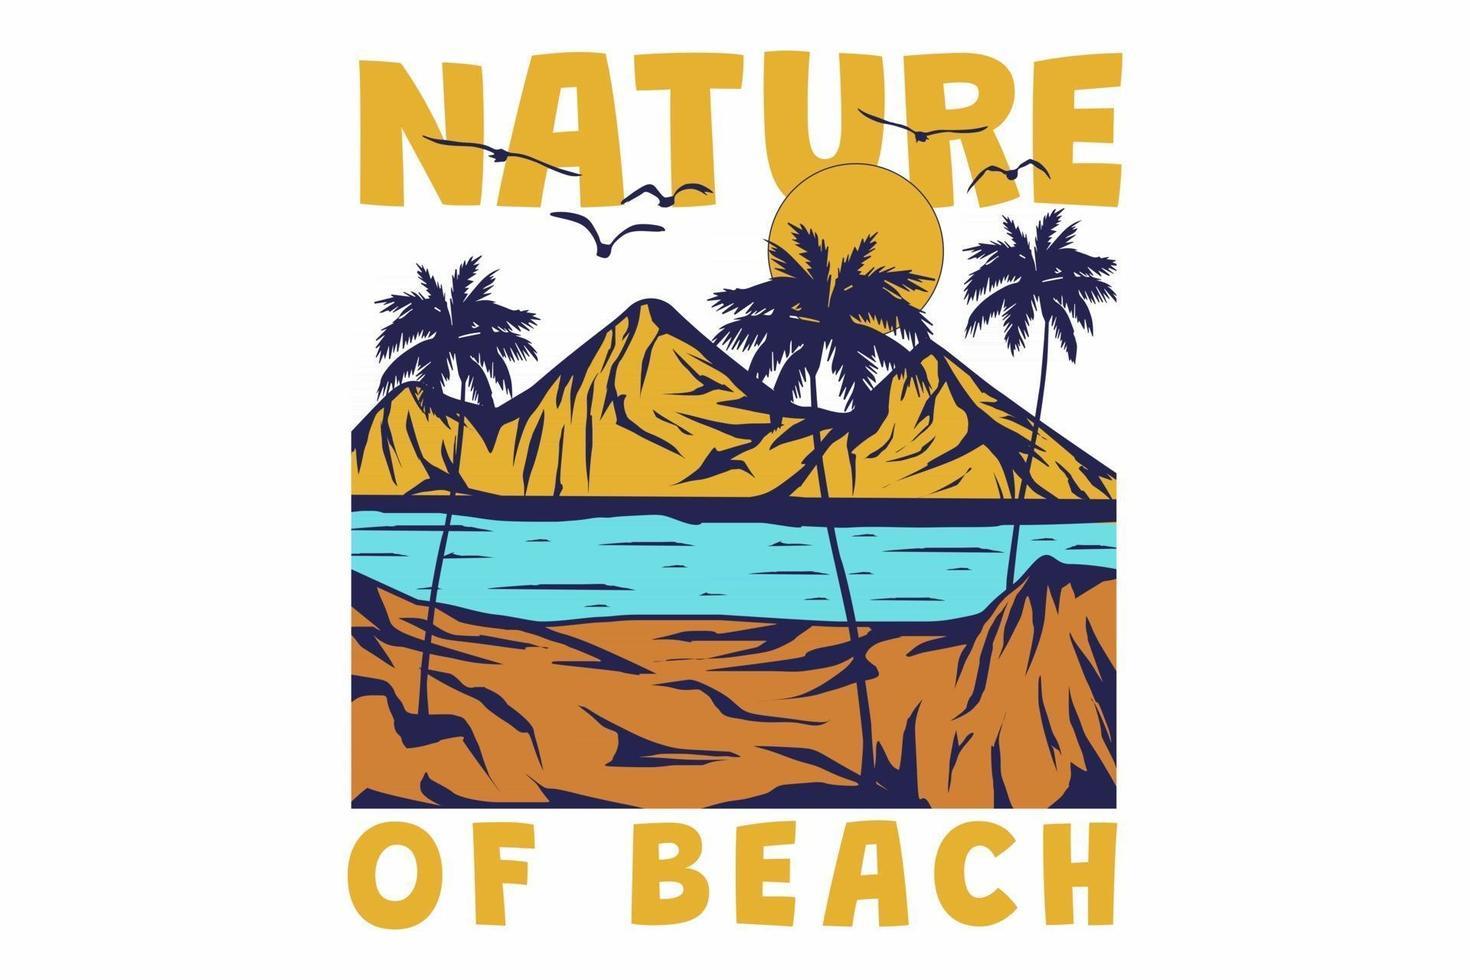 T-shirt retro beach mountain tree nature vintage style hand drawn vector